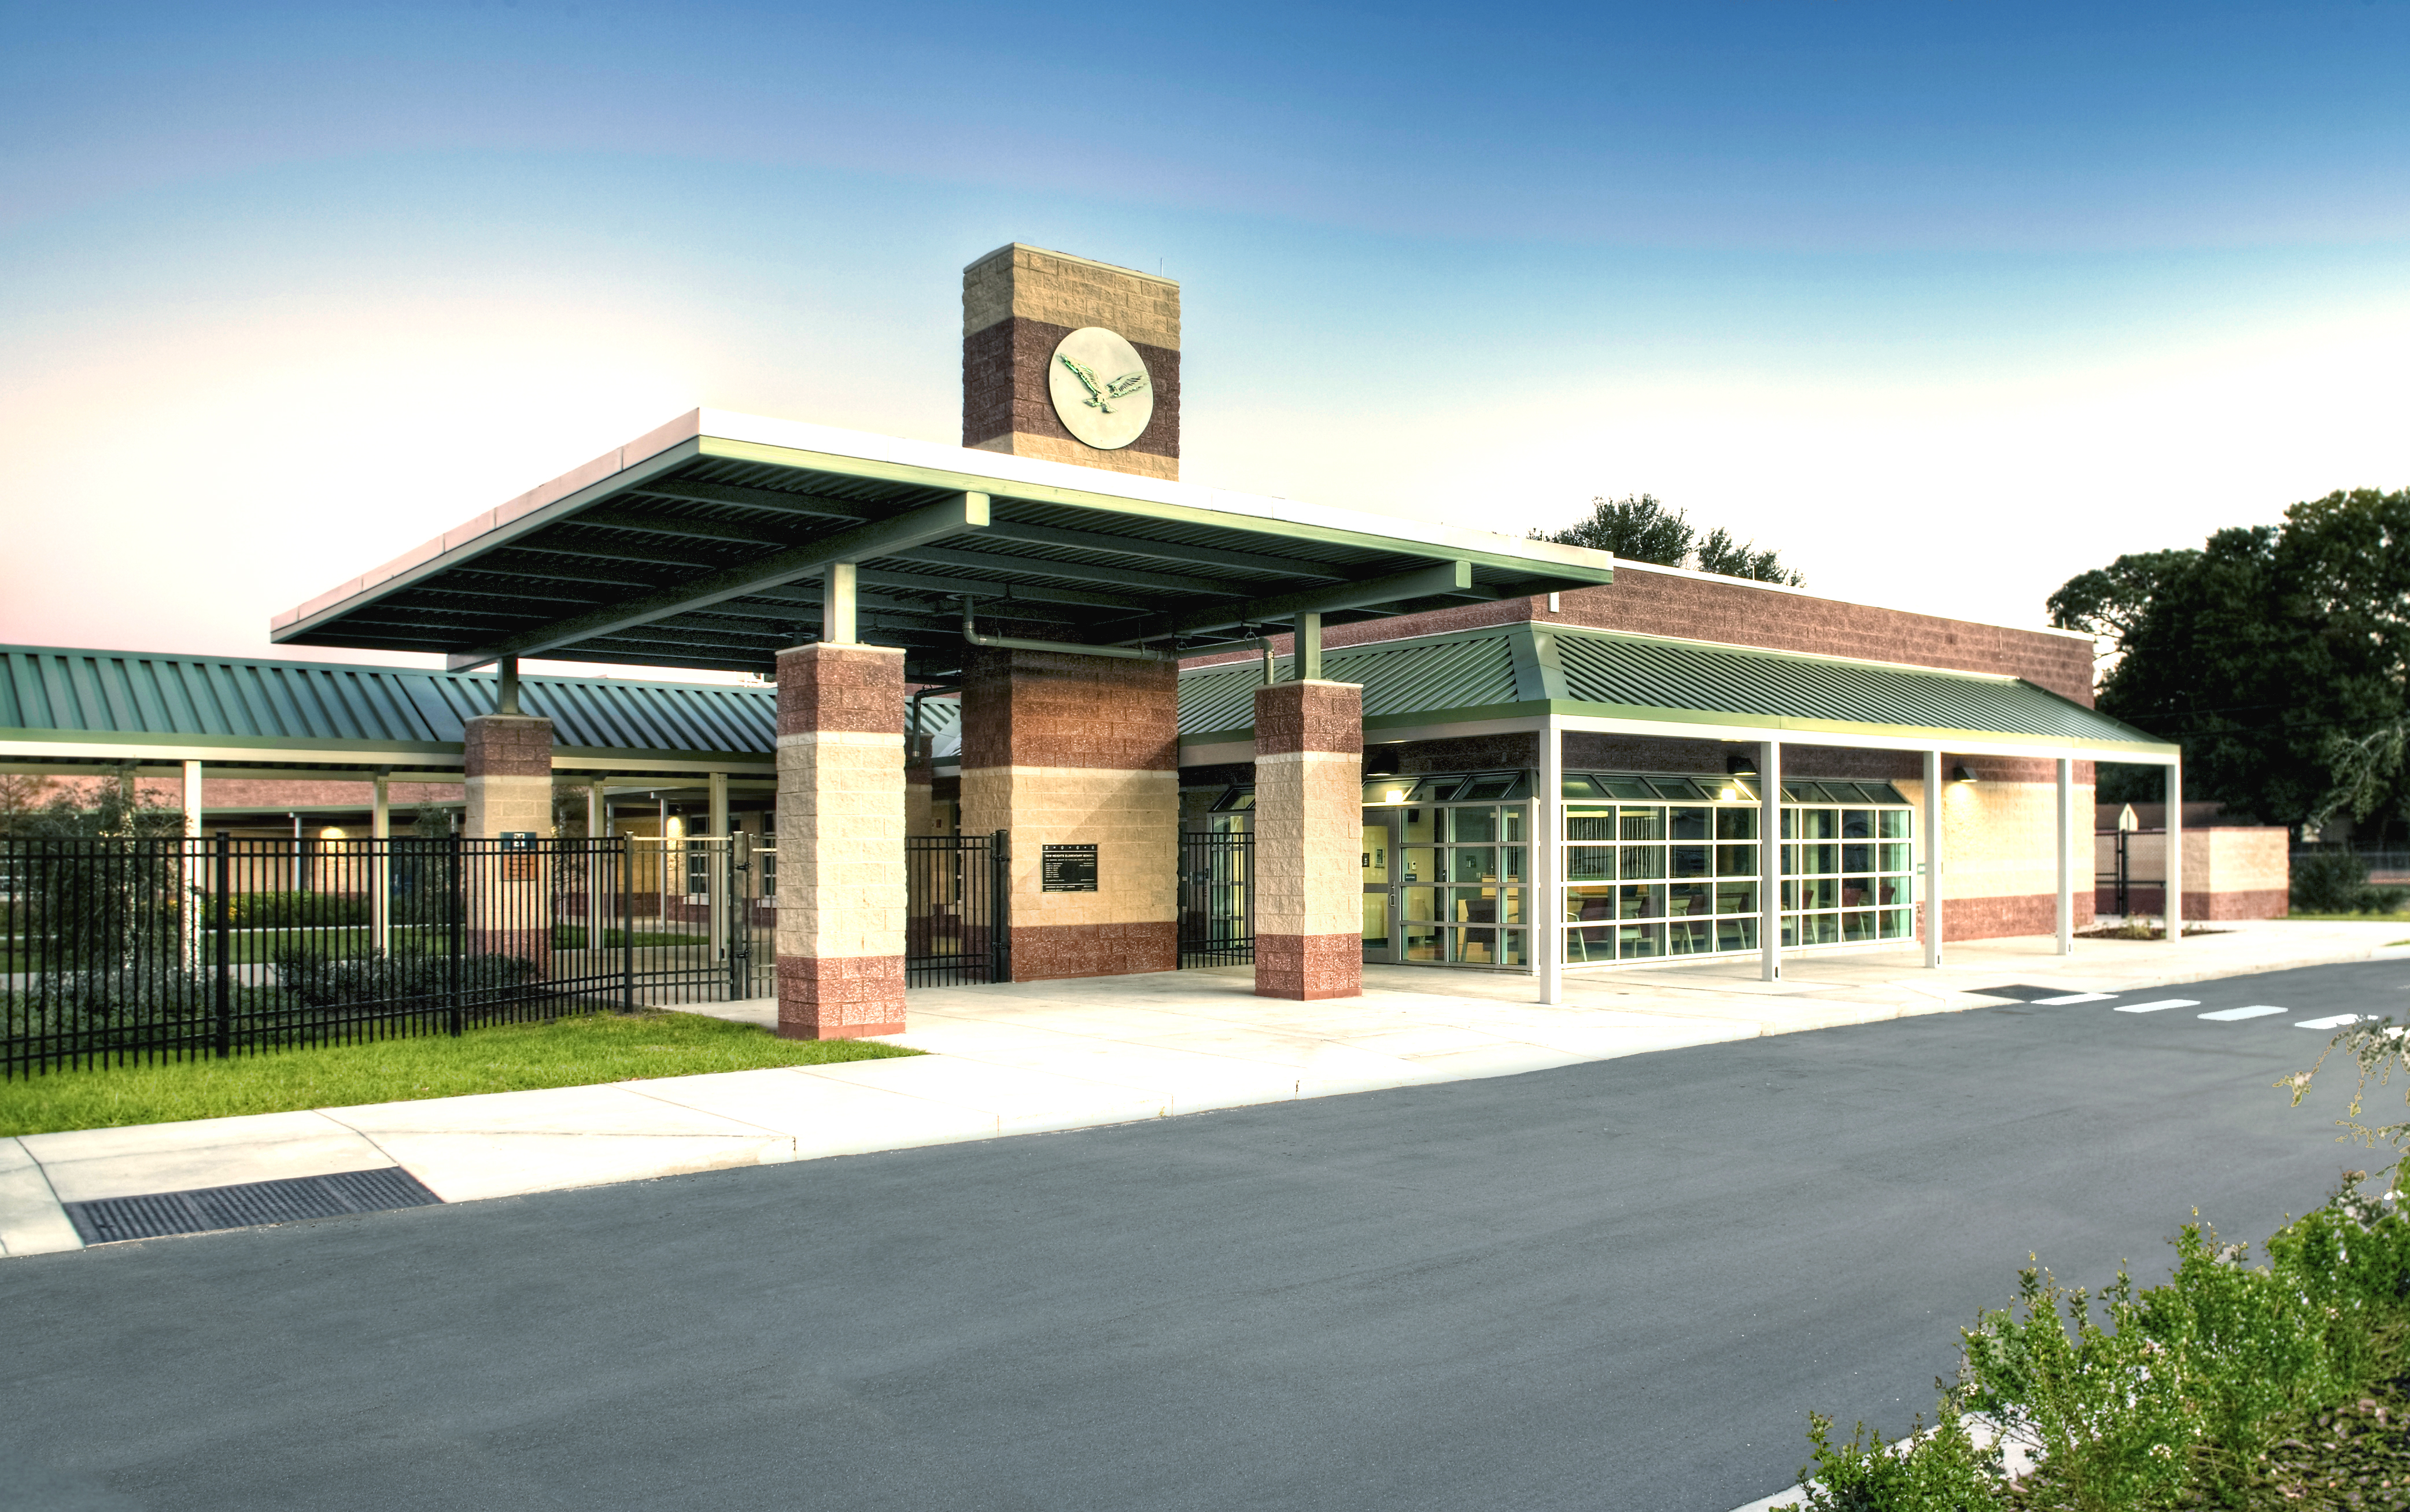 New Heights Elementary School